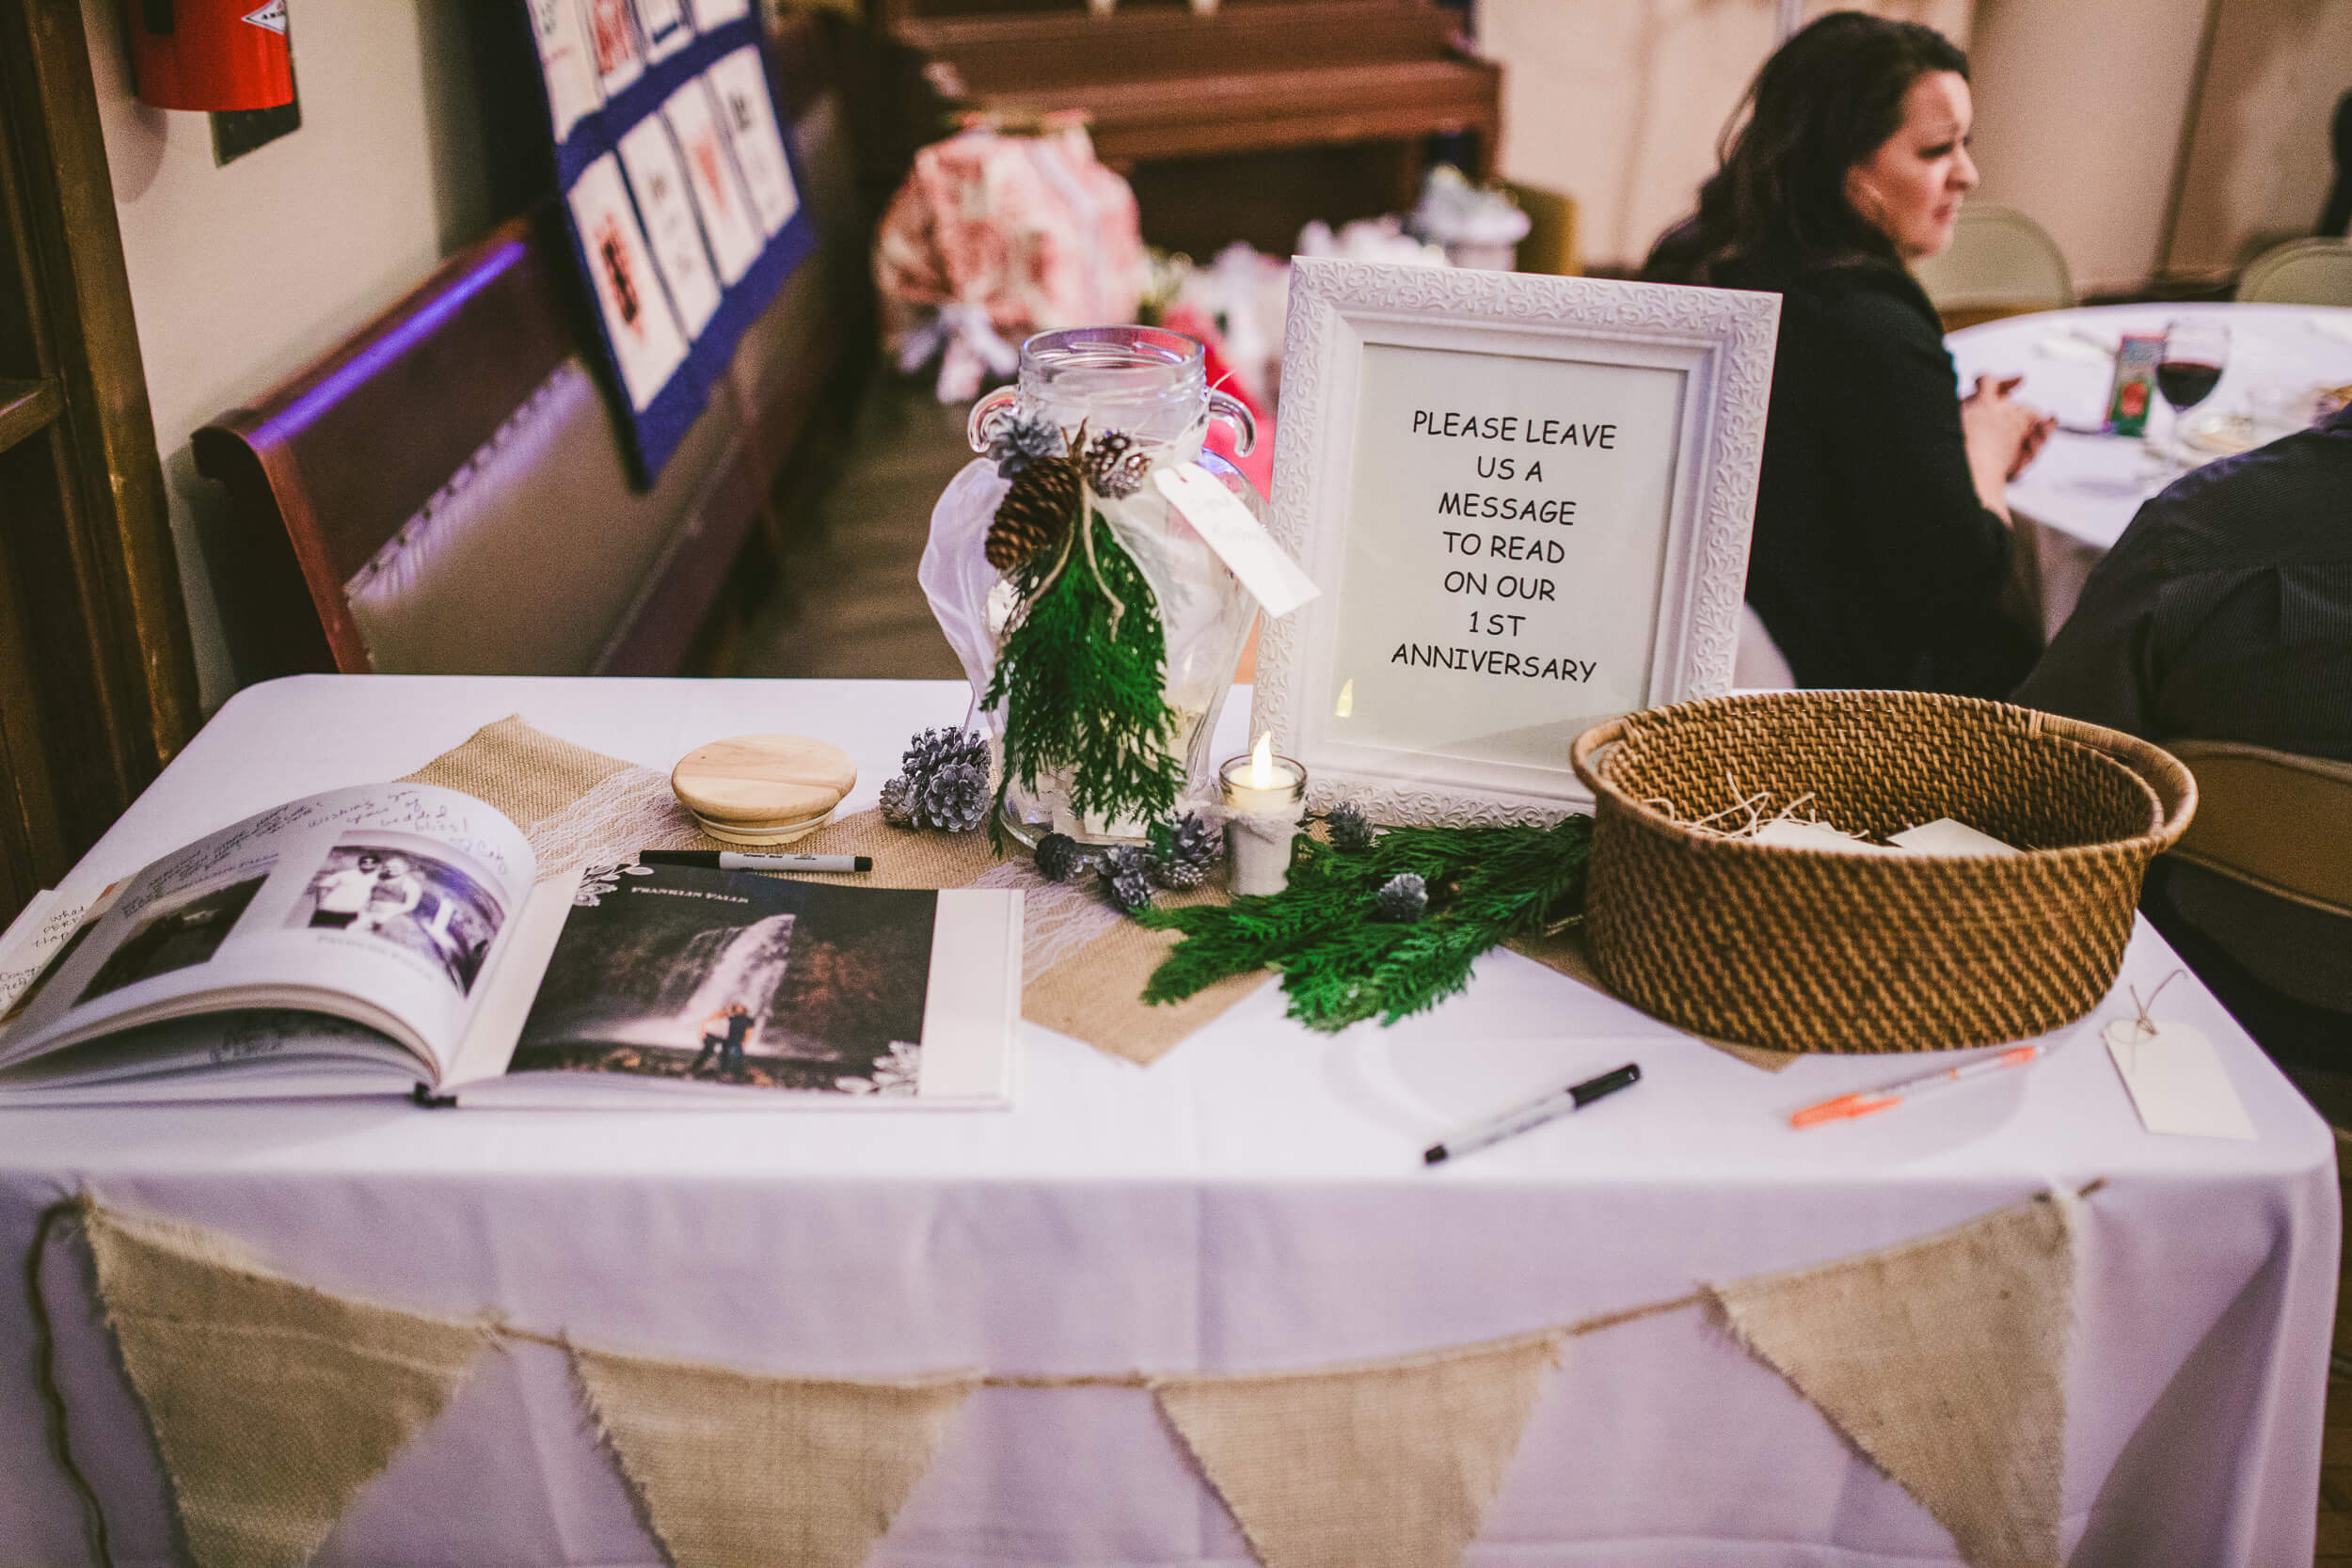 mukogawa winter wedding in spokane (207).jpg